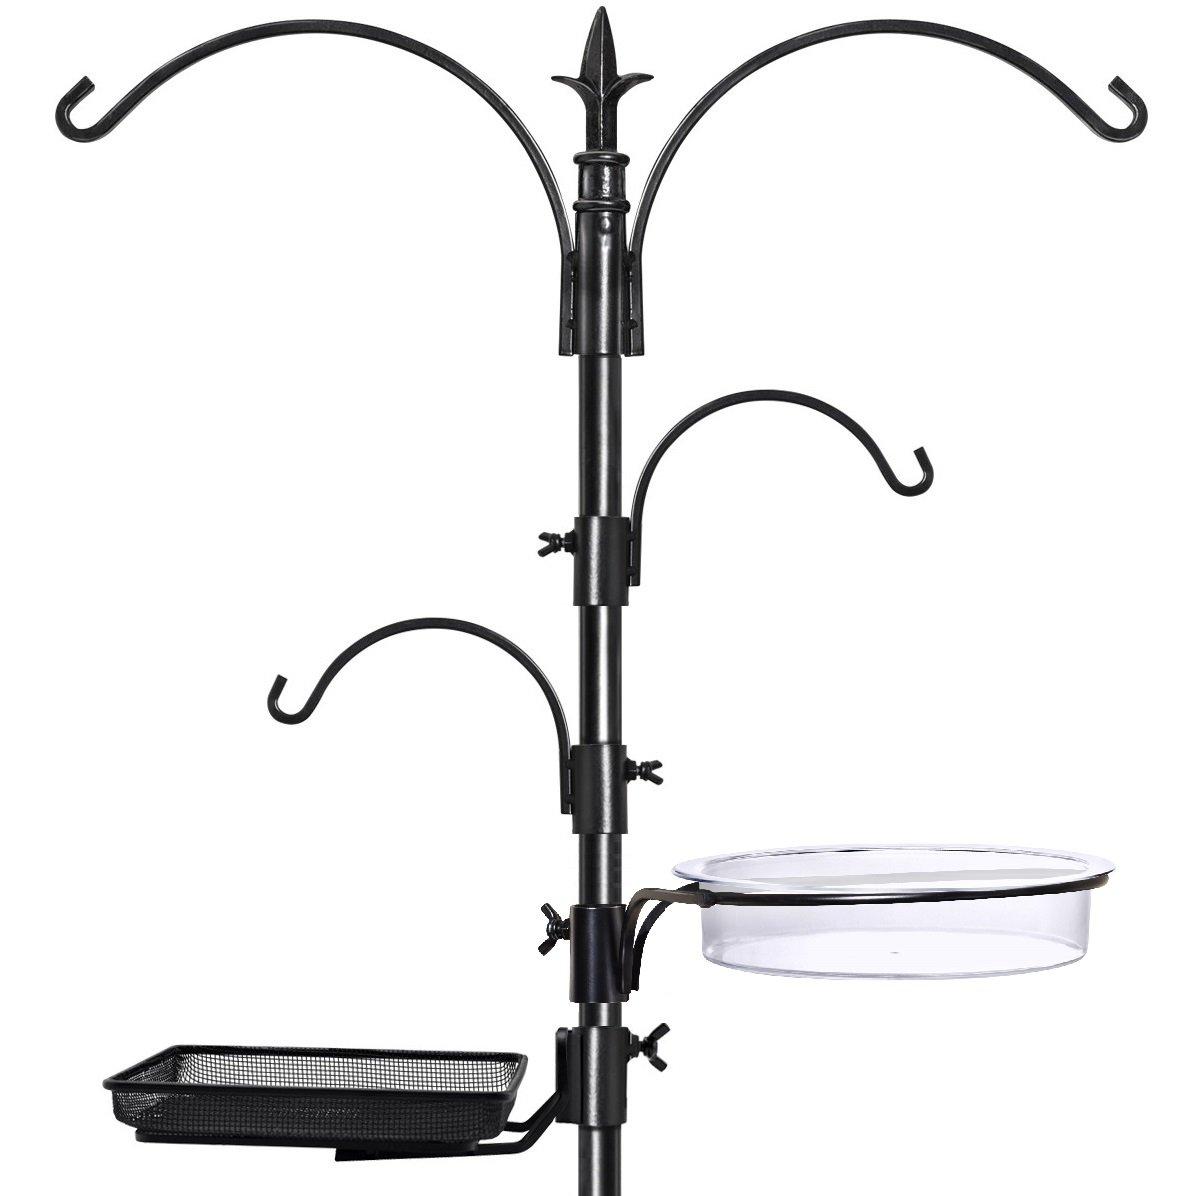 GrayBunny GB-6844 Premium Bird Feeding Station Kit, 22'' Wide x 91'' Tall (82 inch above ground) Black, A Multi Feeder Hanging Kit & Bird Bath For Attracting Wild Birds, Birdfeeder and Planter Hanger